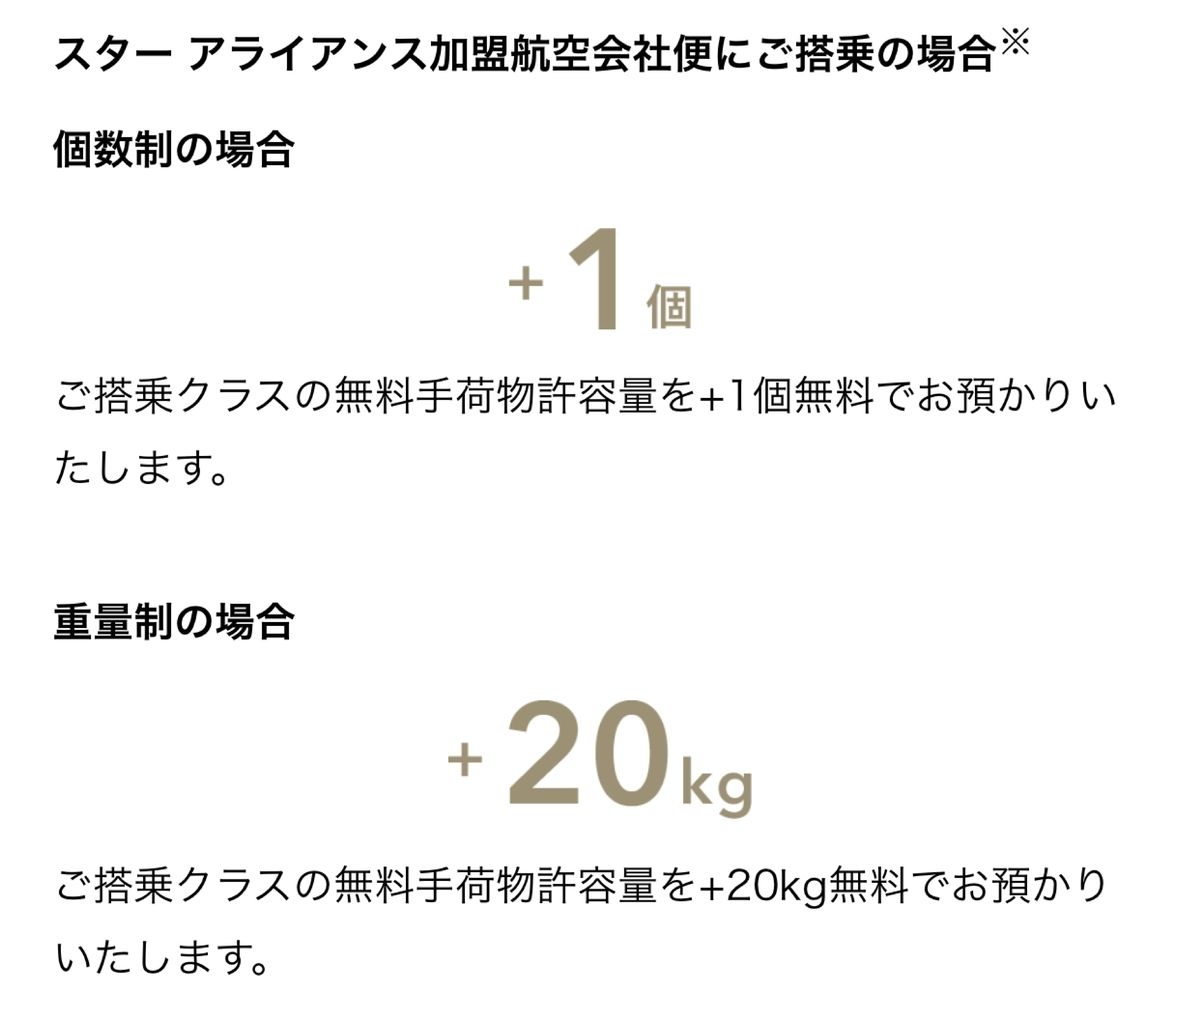 f:id:Nagoya1976:20191203204102j:plain